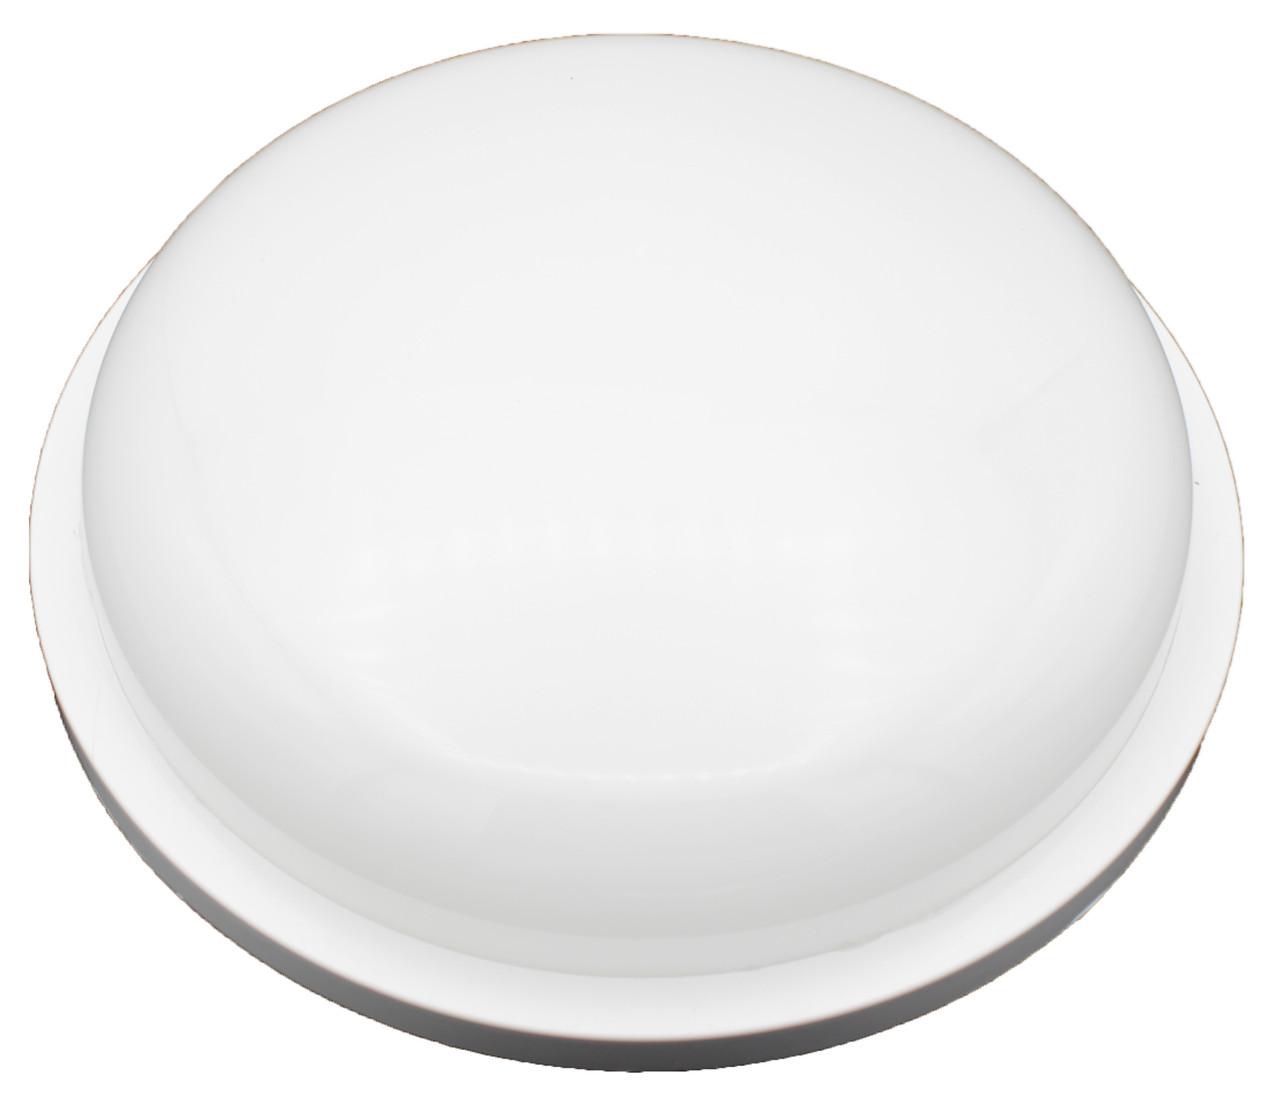 #120/1 AVT-ROUND5-20W-DATEX Pure White Светодиодный светильник